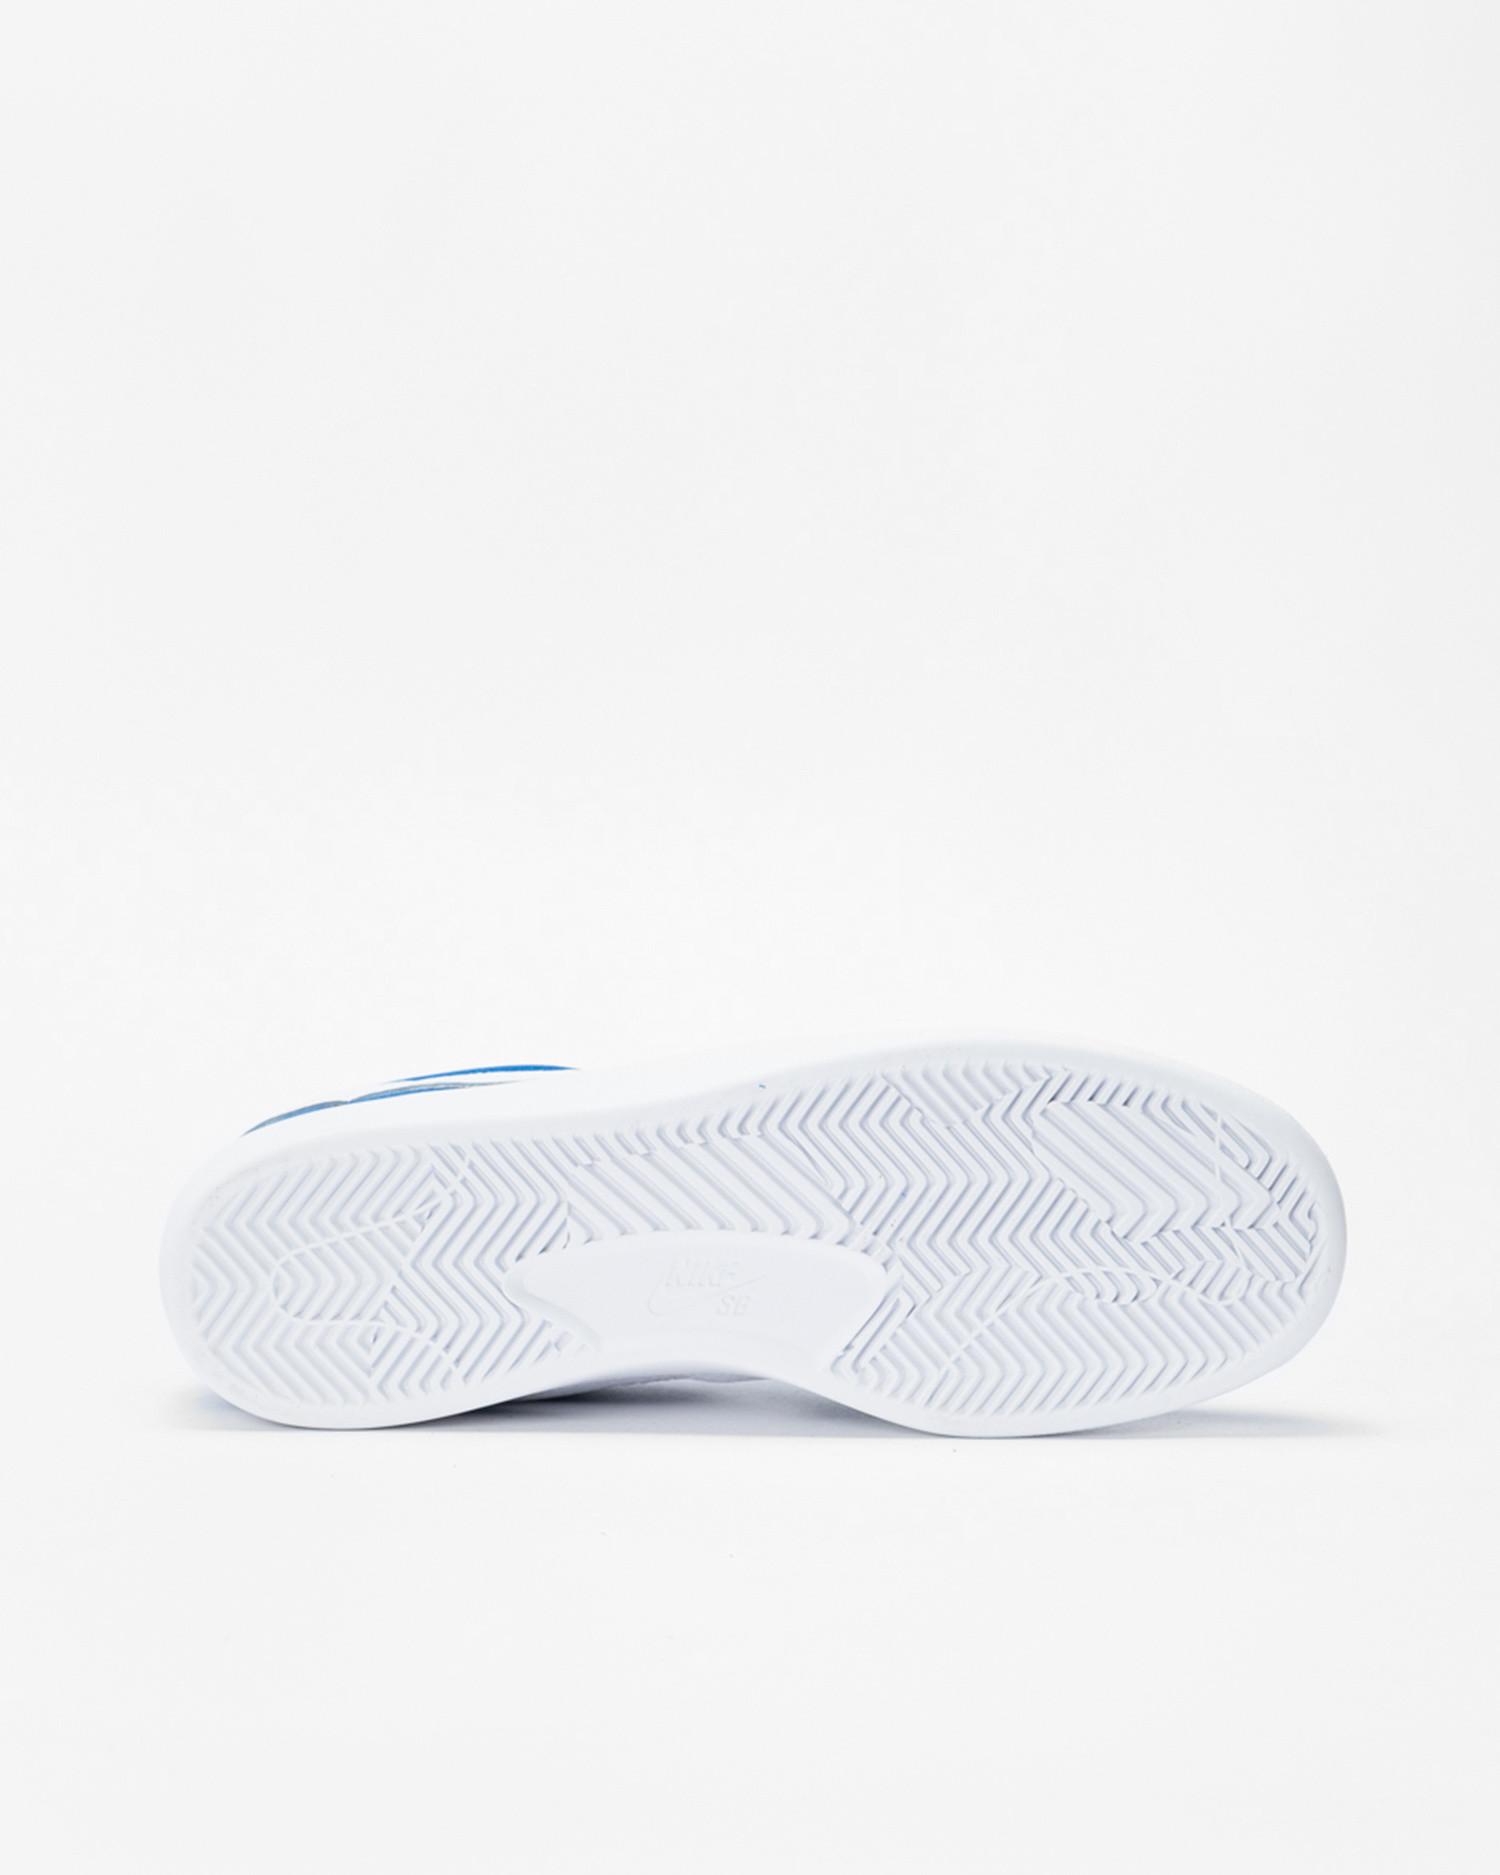 Nike Sb Bruin React Team royal/white-team royal-white